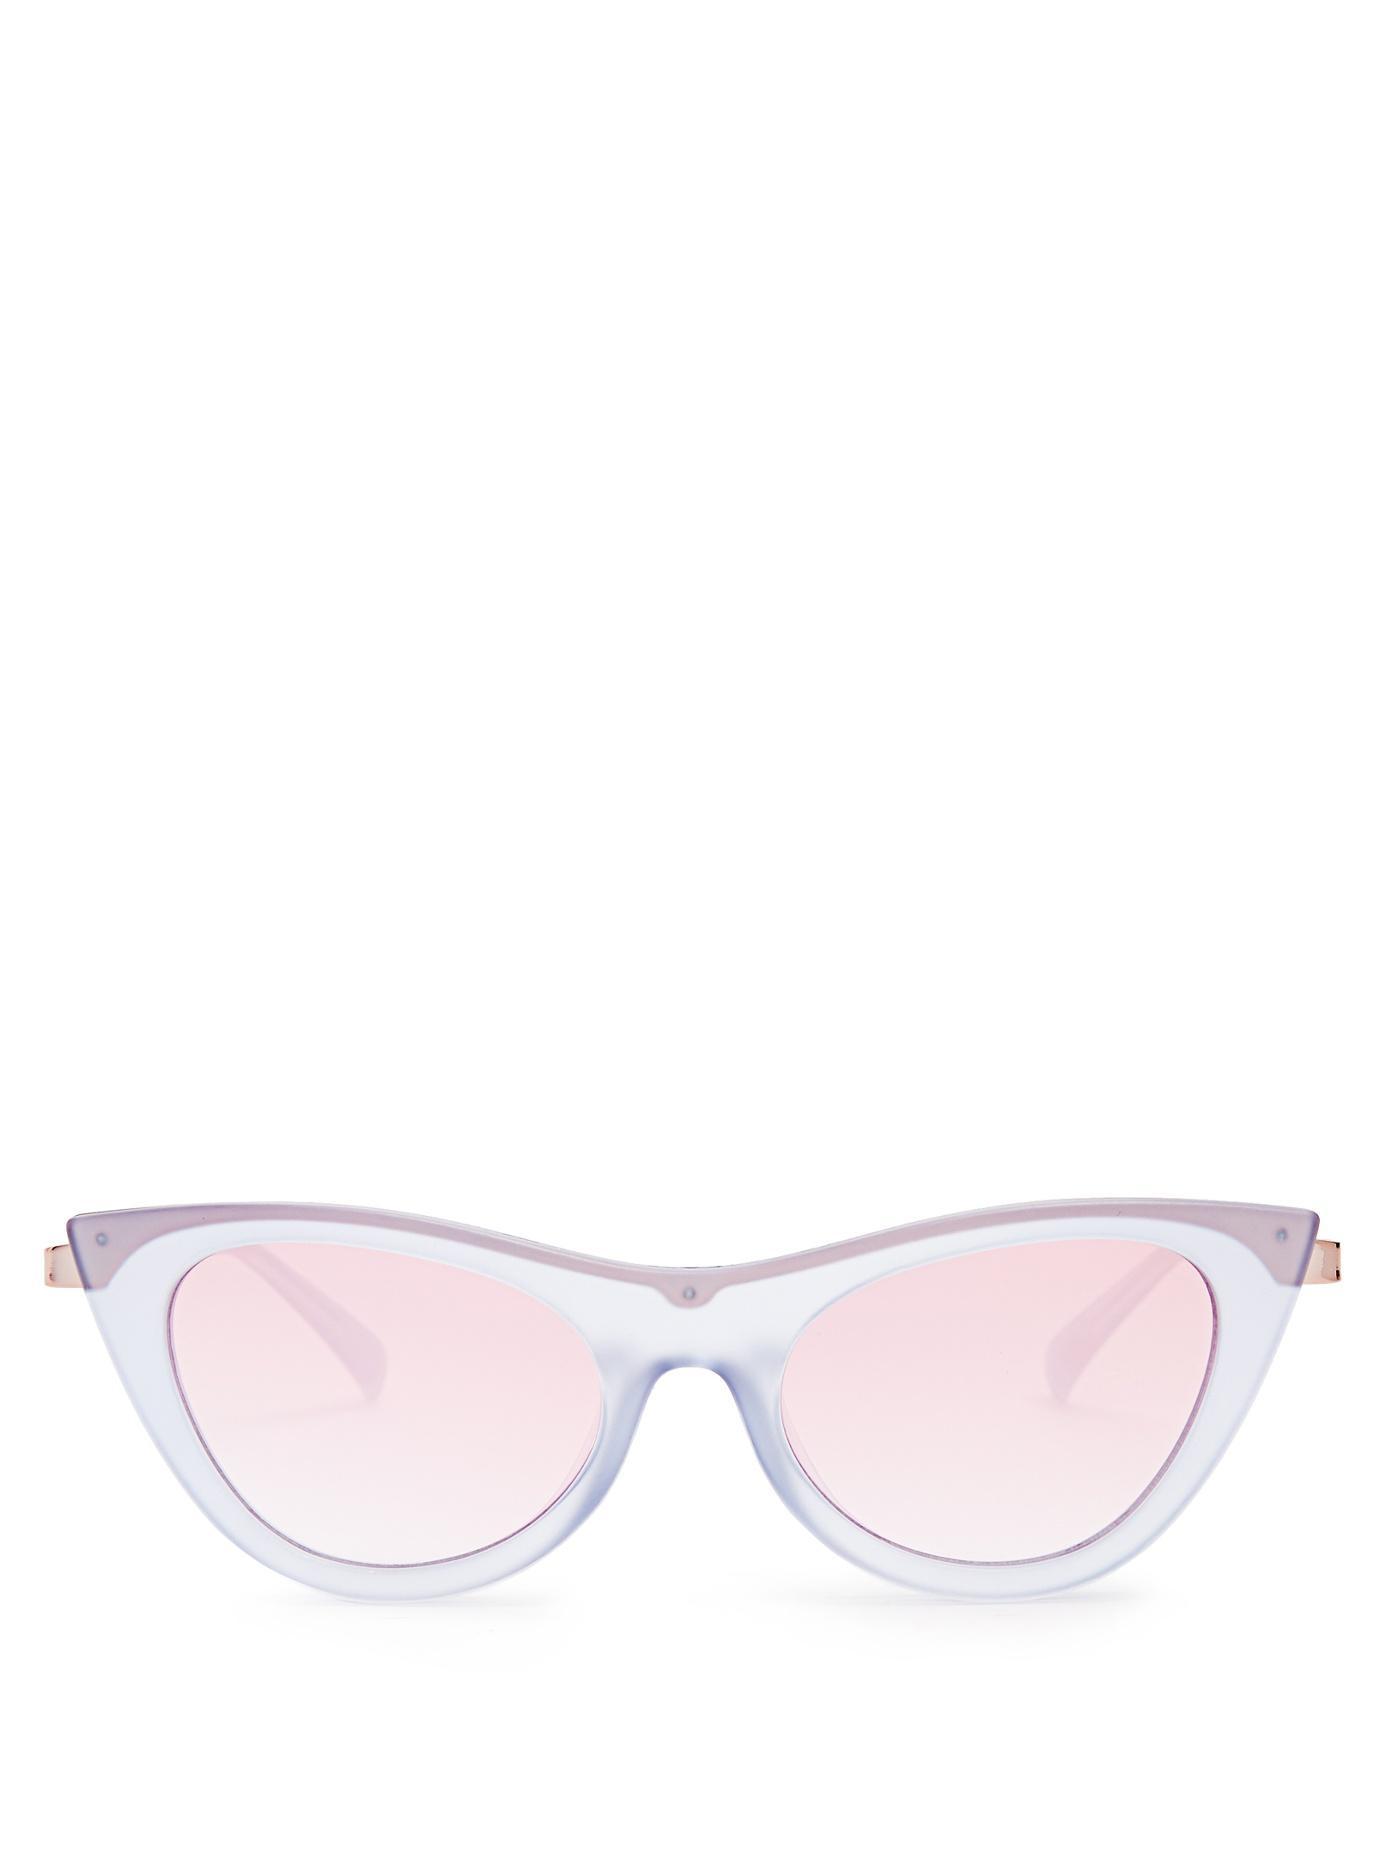 3ca49704b26d Le Specs Enchantress Cat-Eye Sunglasses In Blue